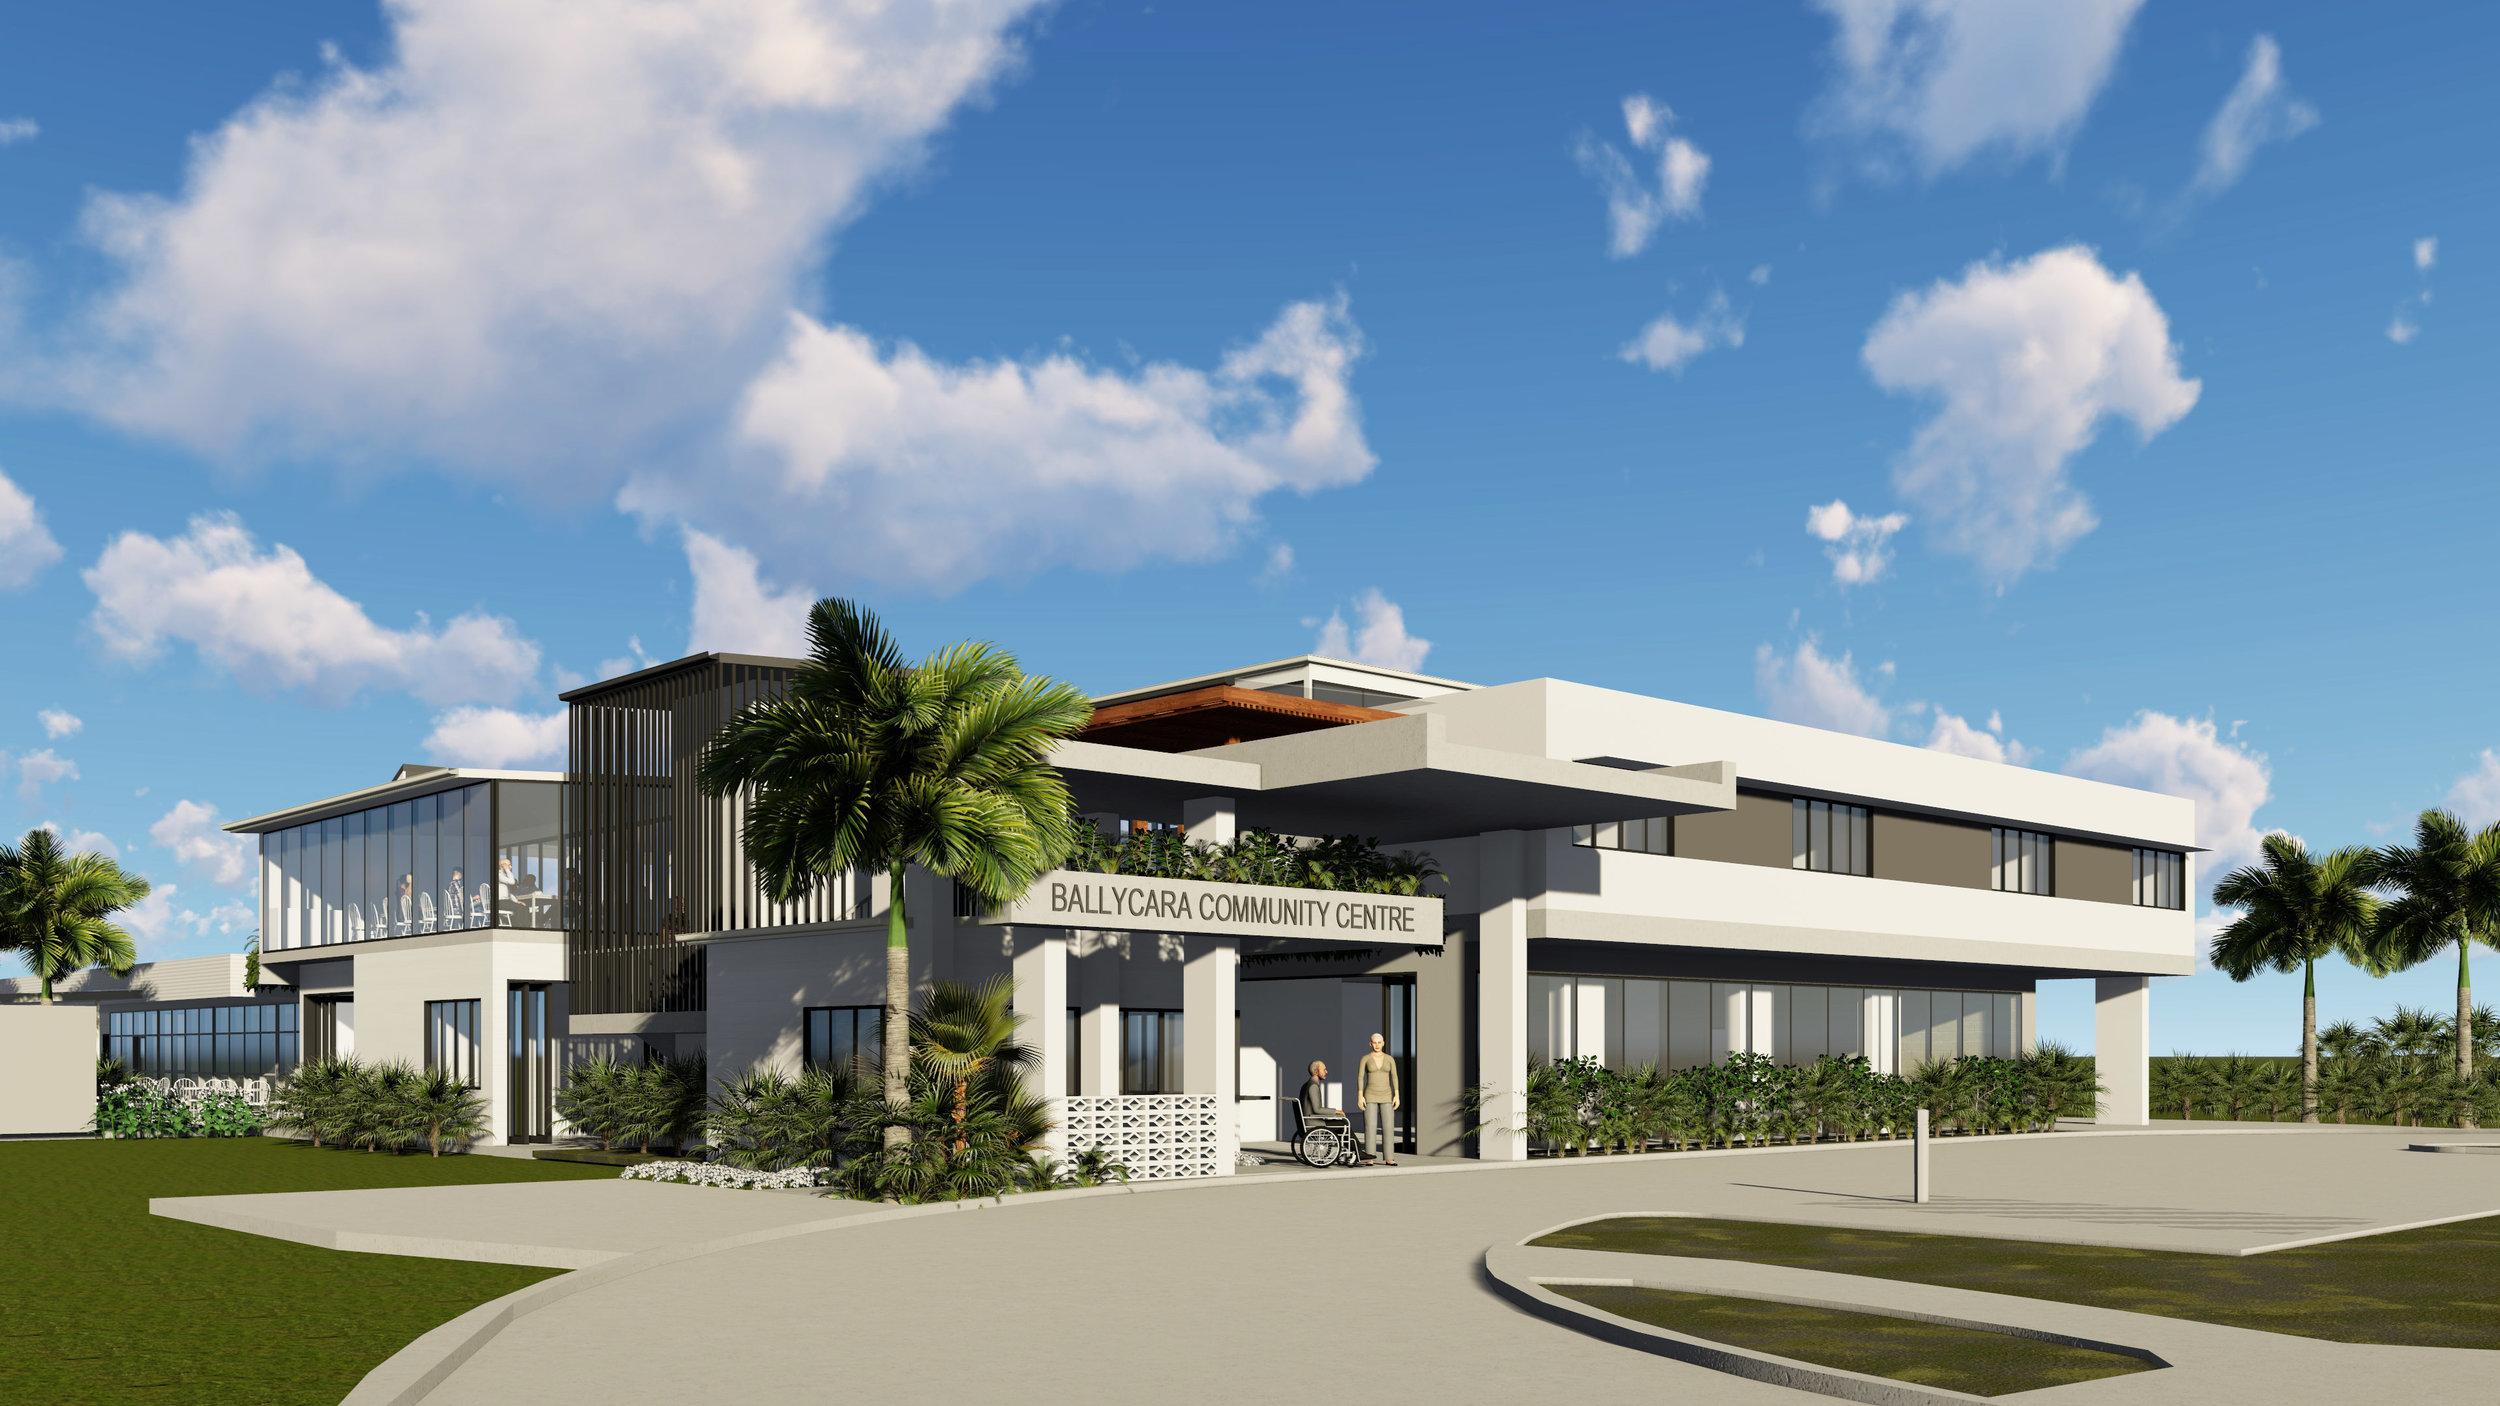 Ballycara Community Centre